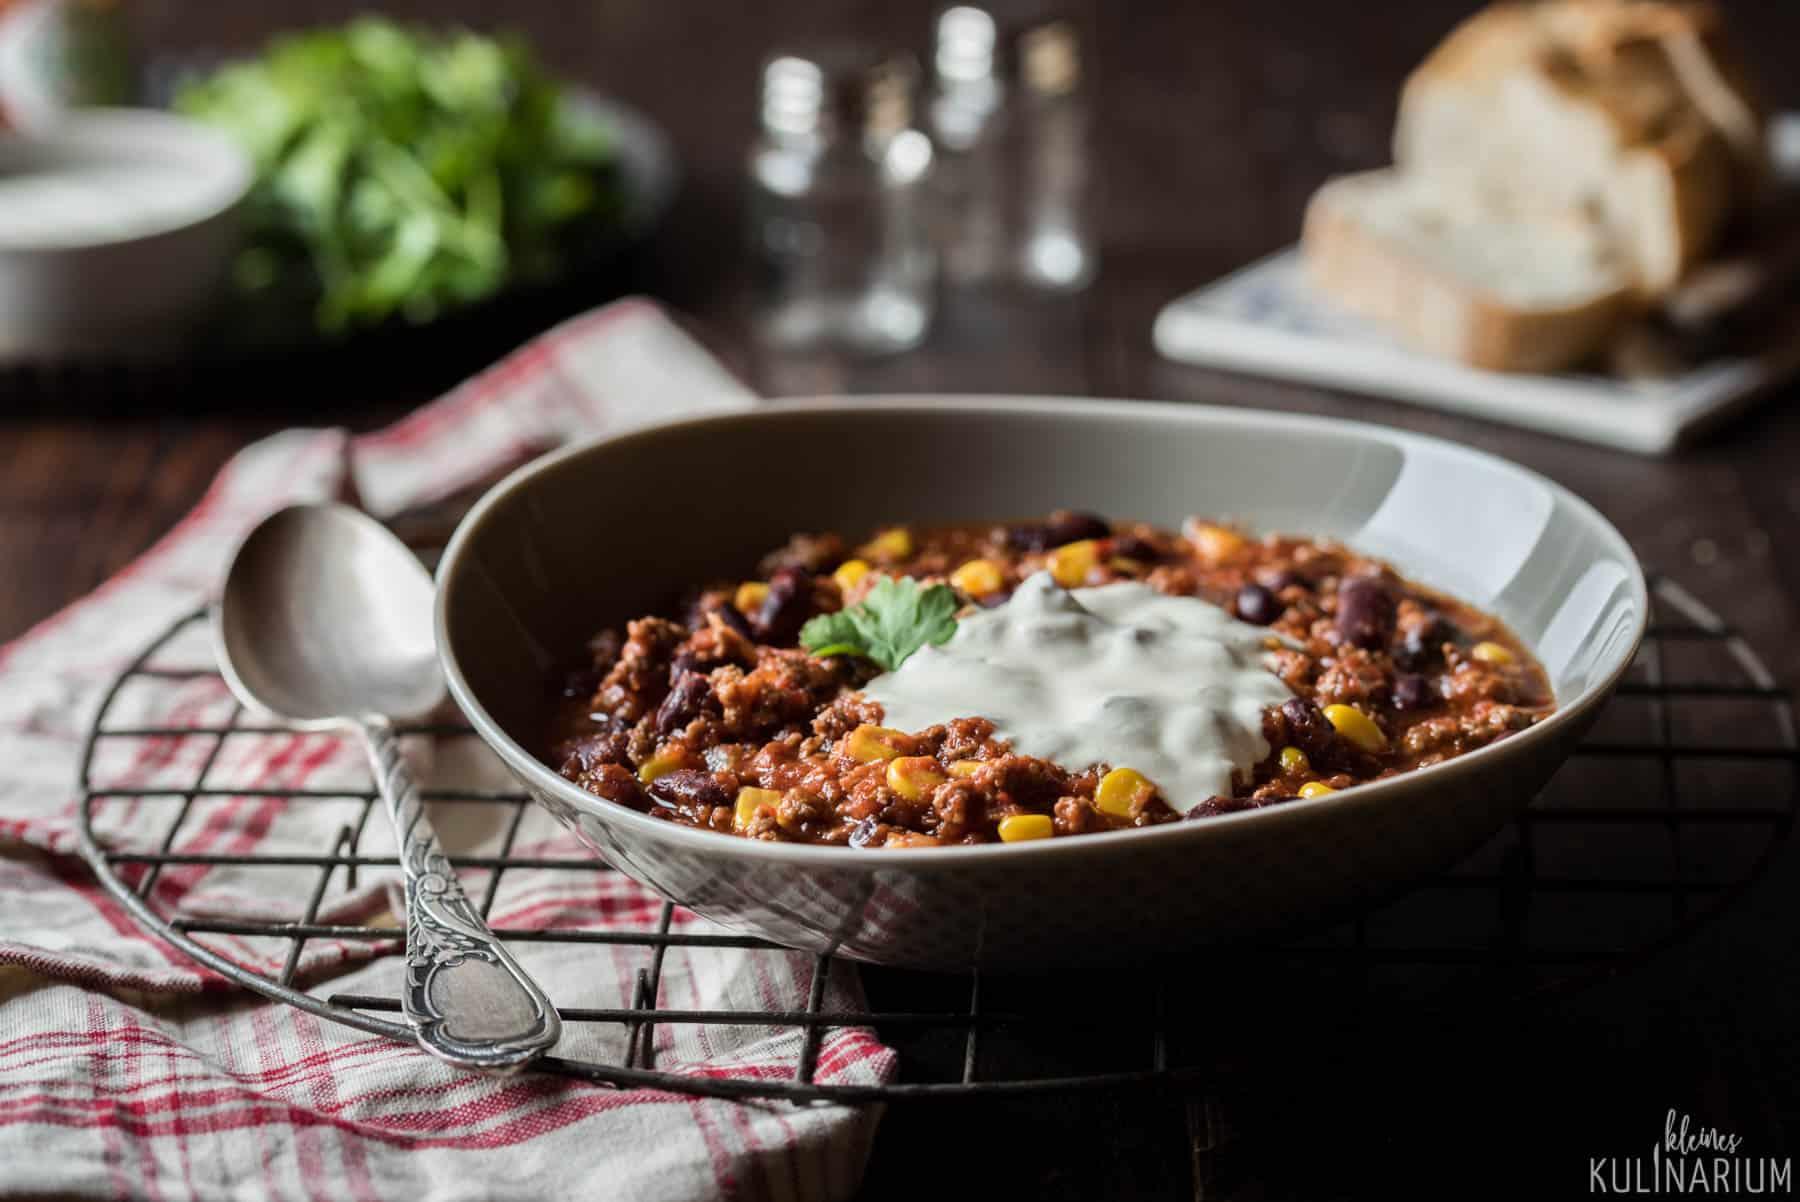 chili con carne meine version dieses klassikers kleines kulinarium. Black Bedroom Furniture Sets. Home Design Ideas